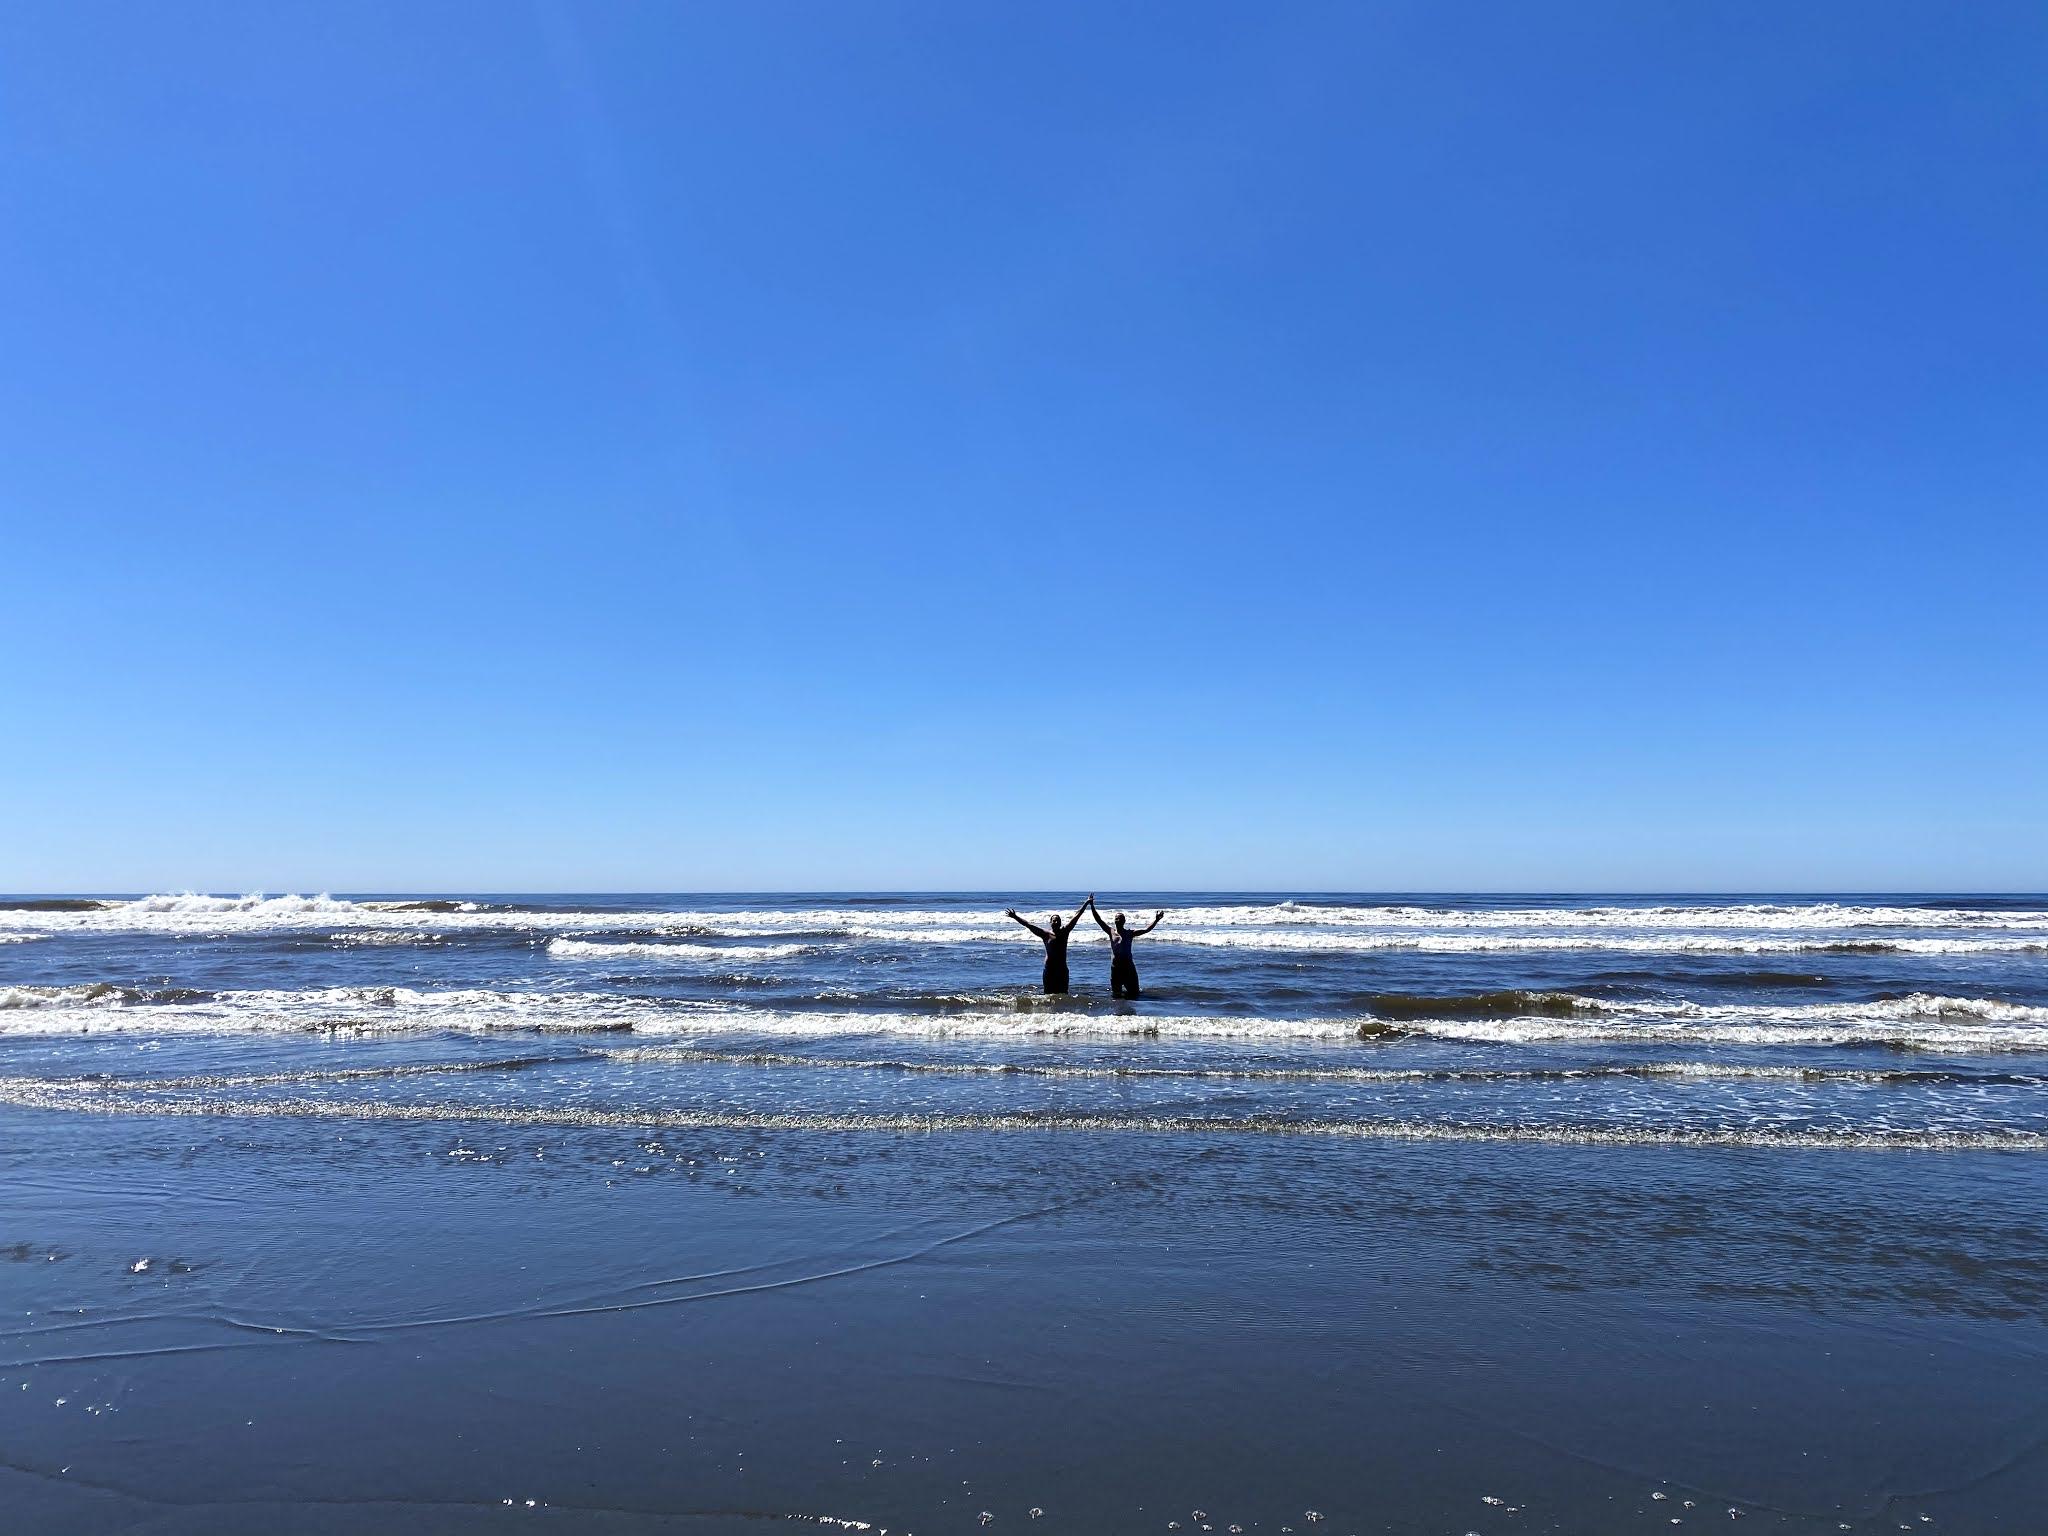 The Pacific Ocean   biblio-style.com